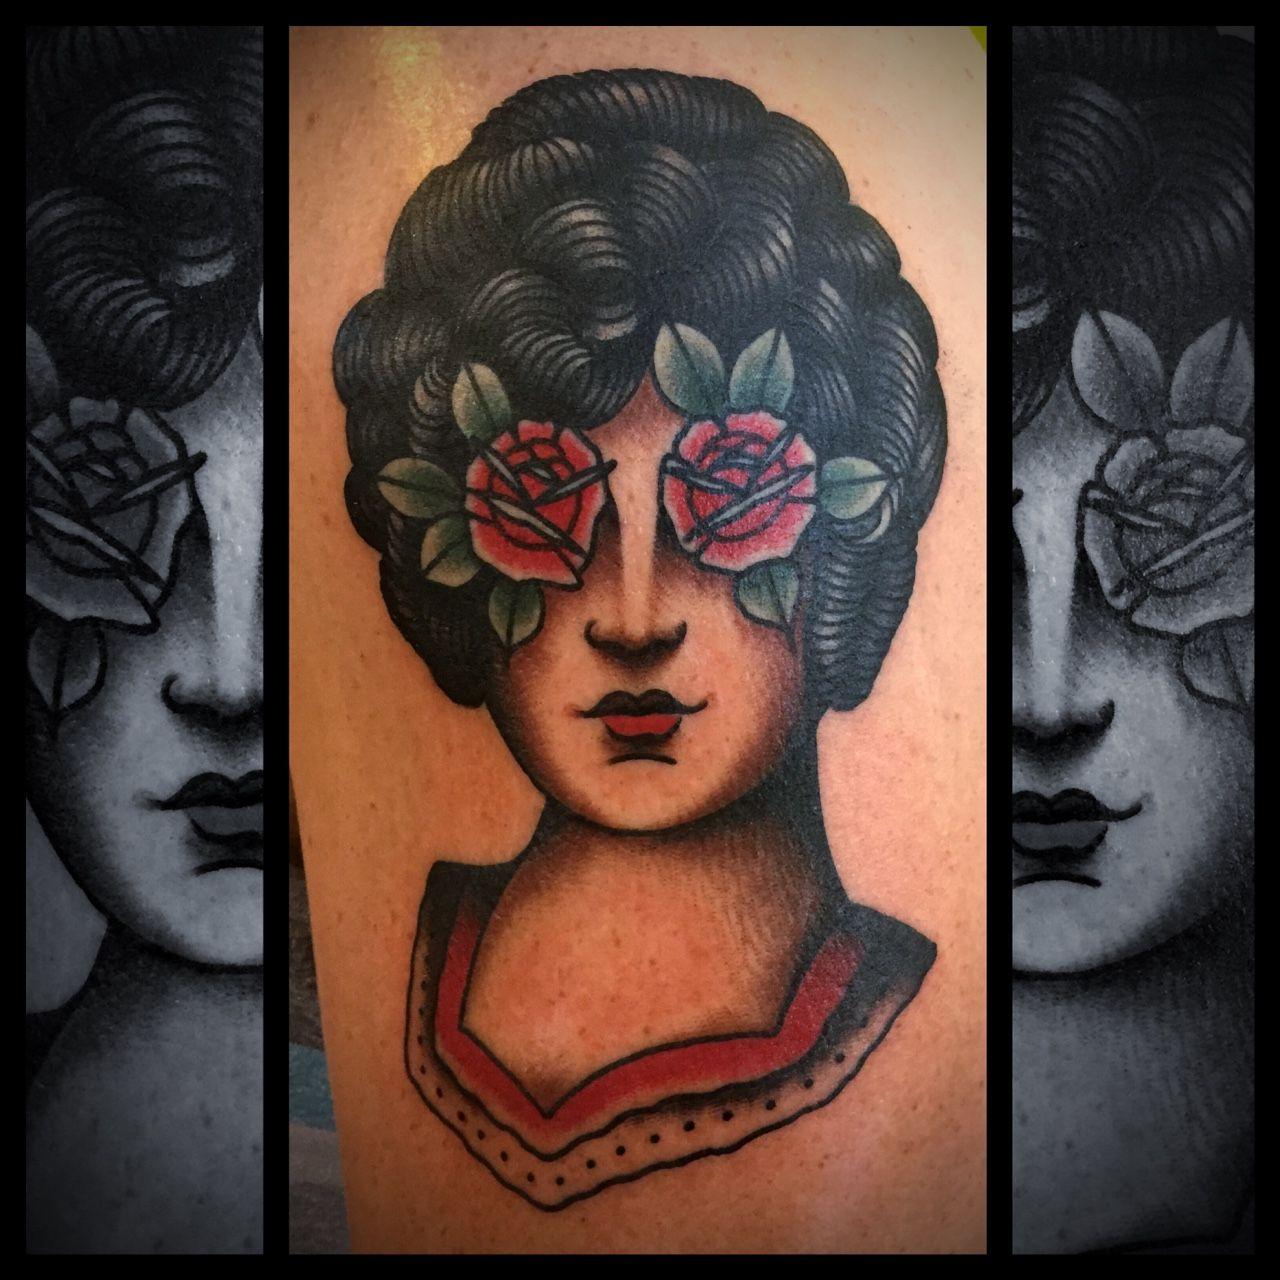 Antonio roque black label tattoo company frederick